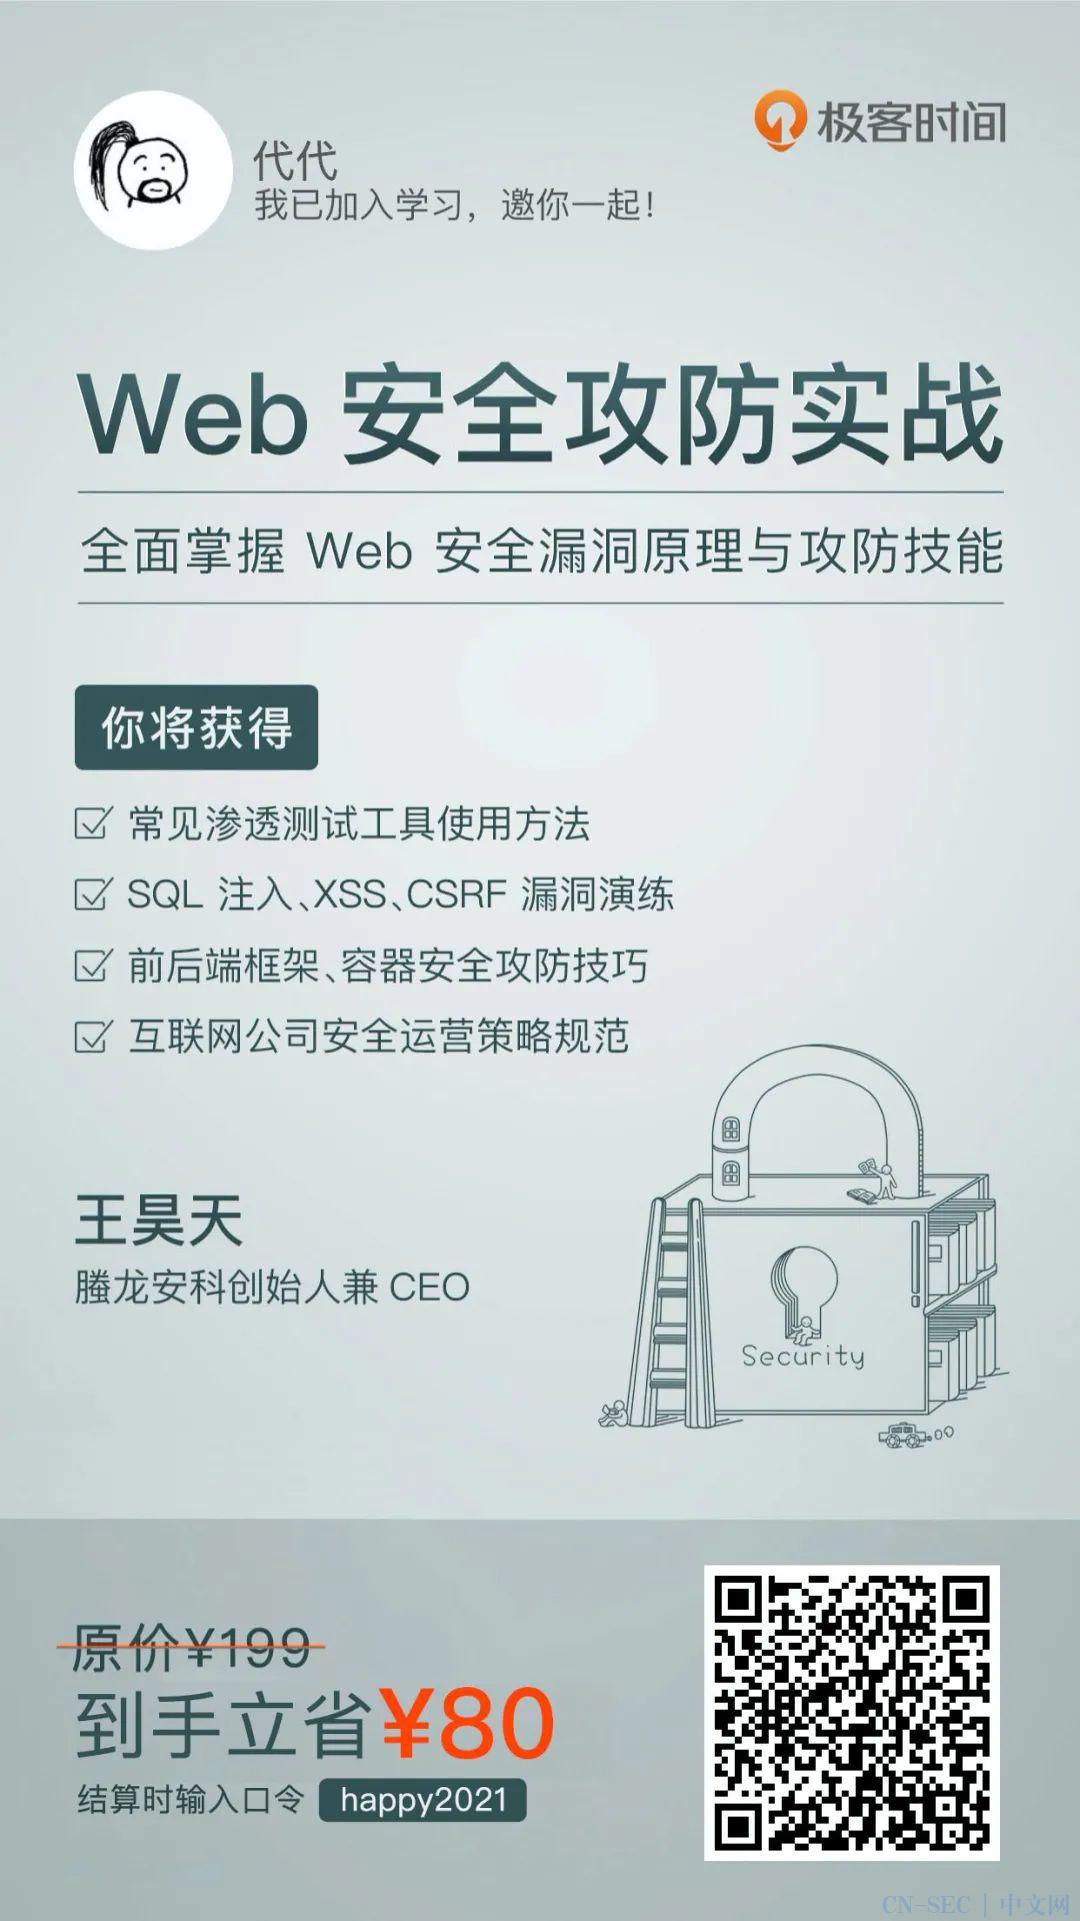 Web 安全问题,远比你想象的严重